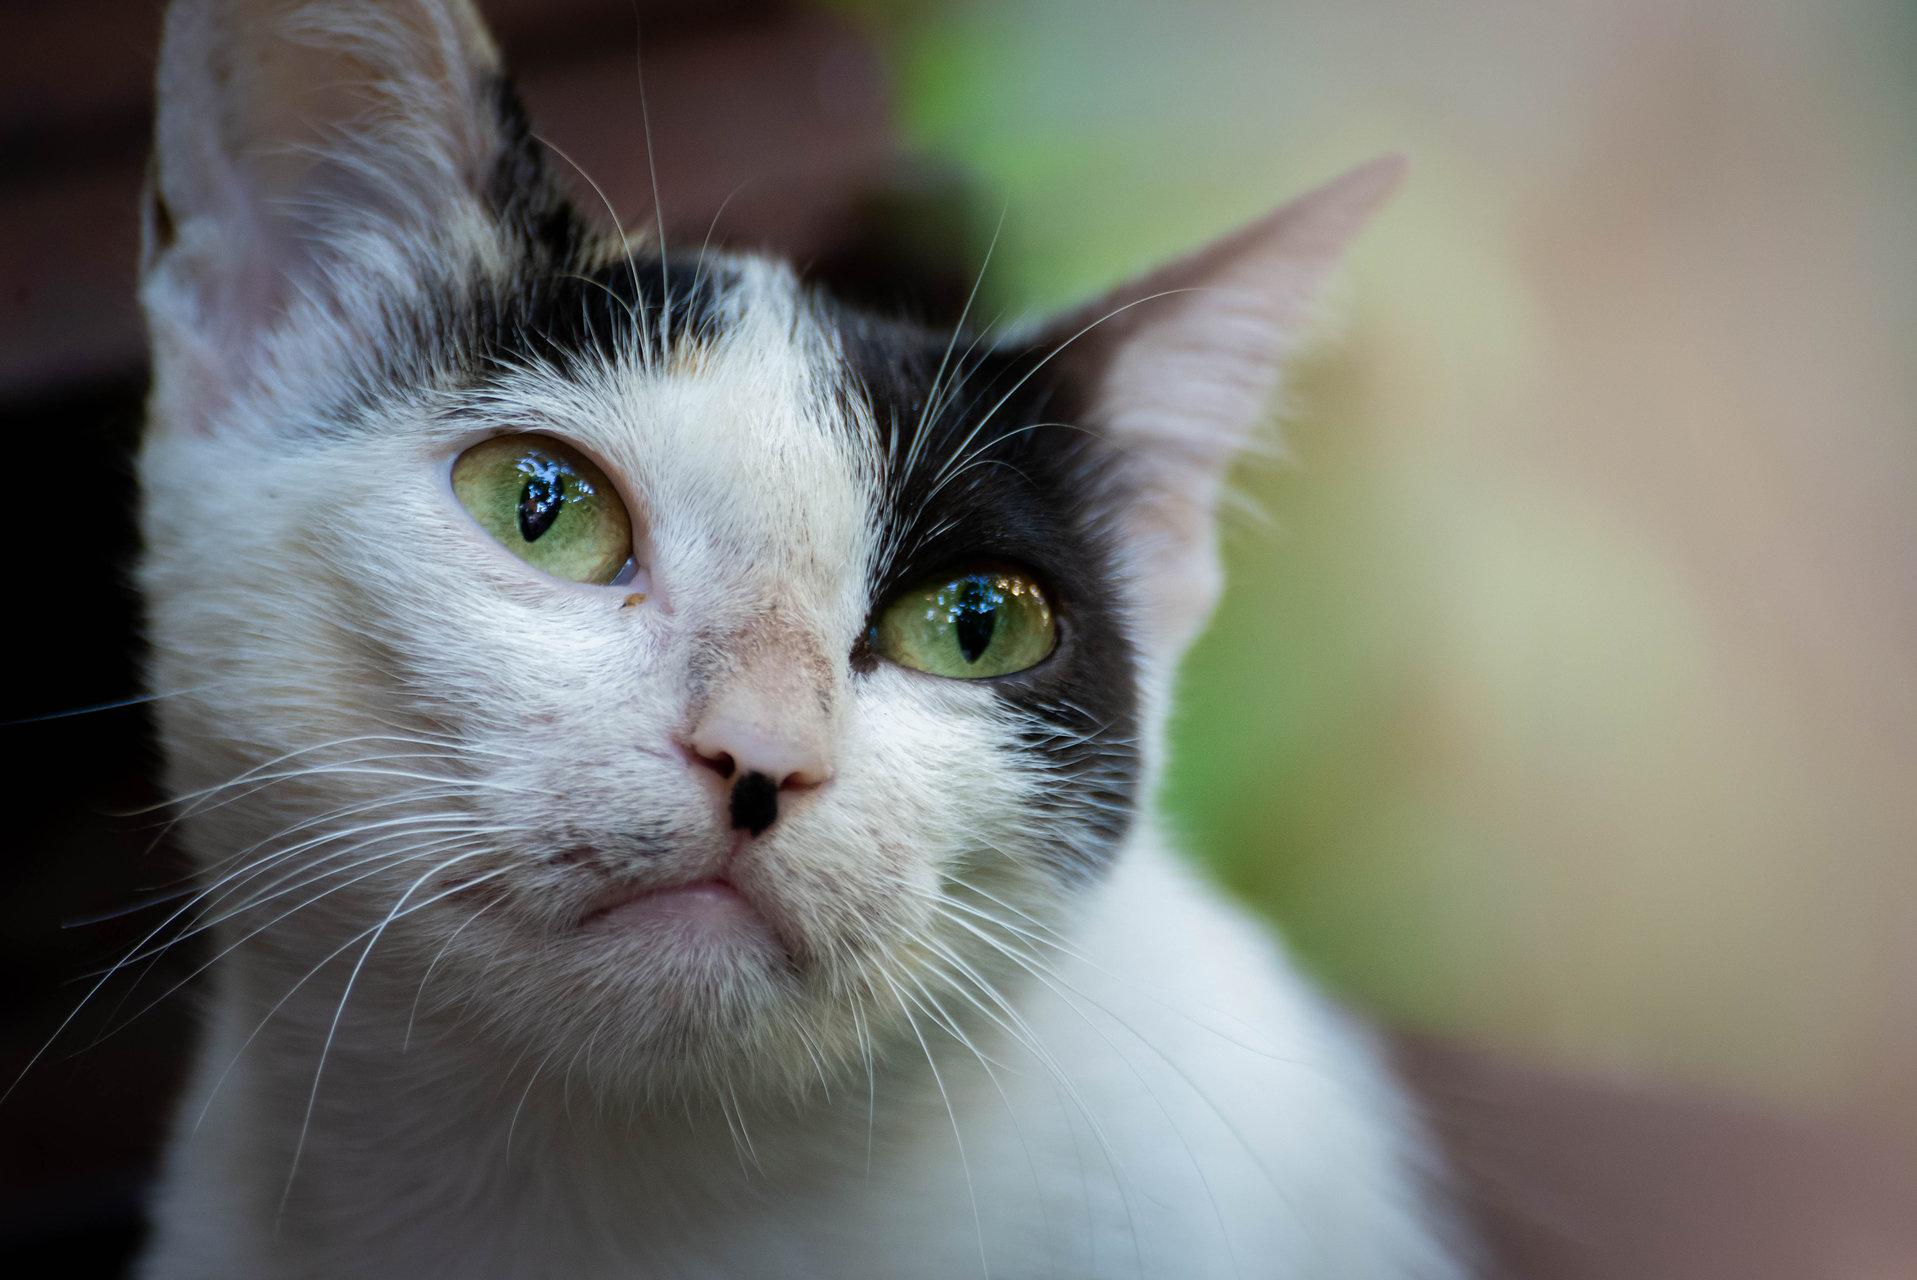 Photo in Pets | Author petrov_m | PHOTO FORUM